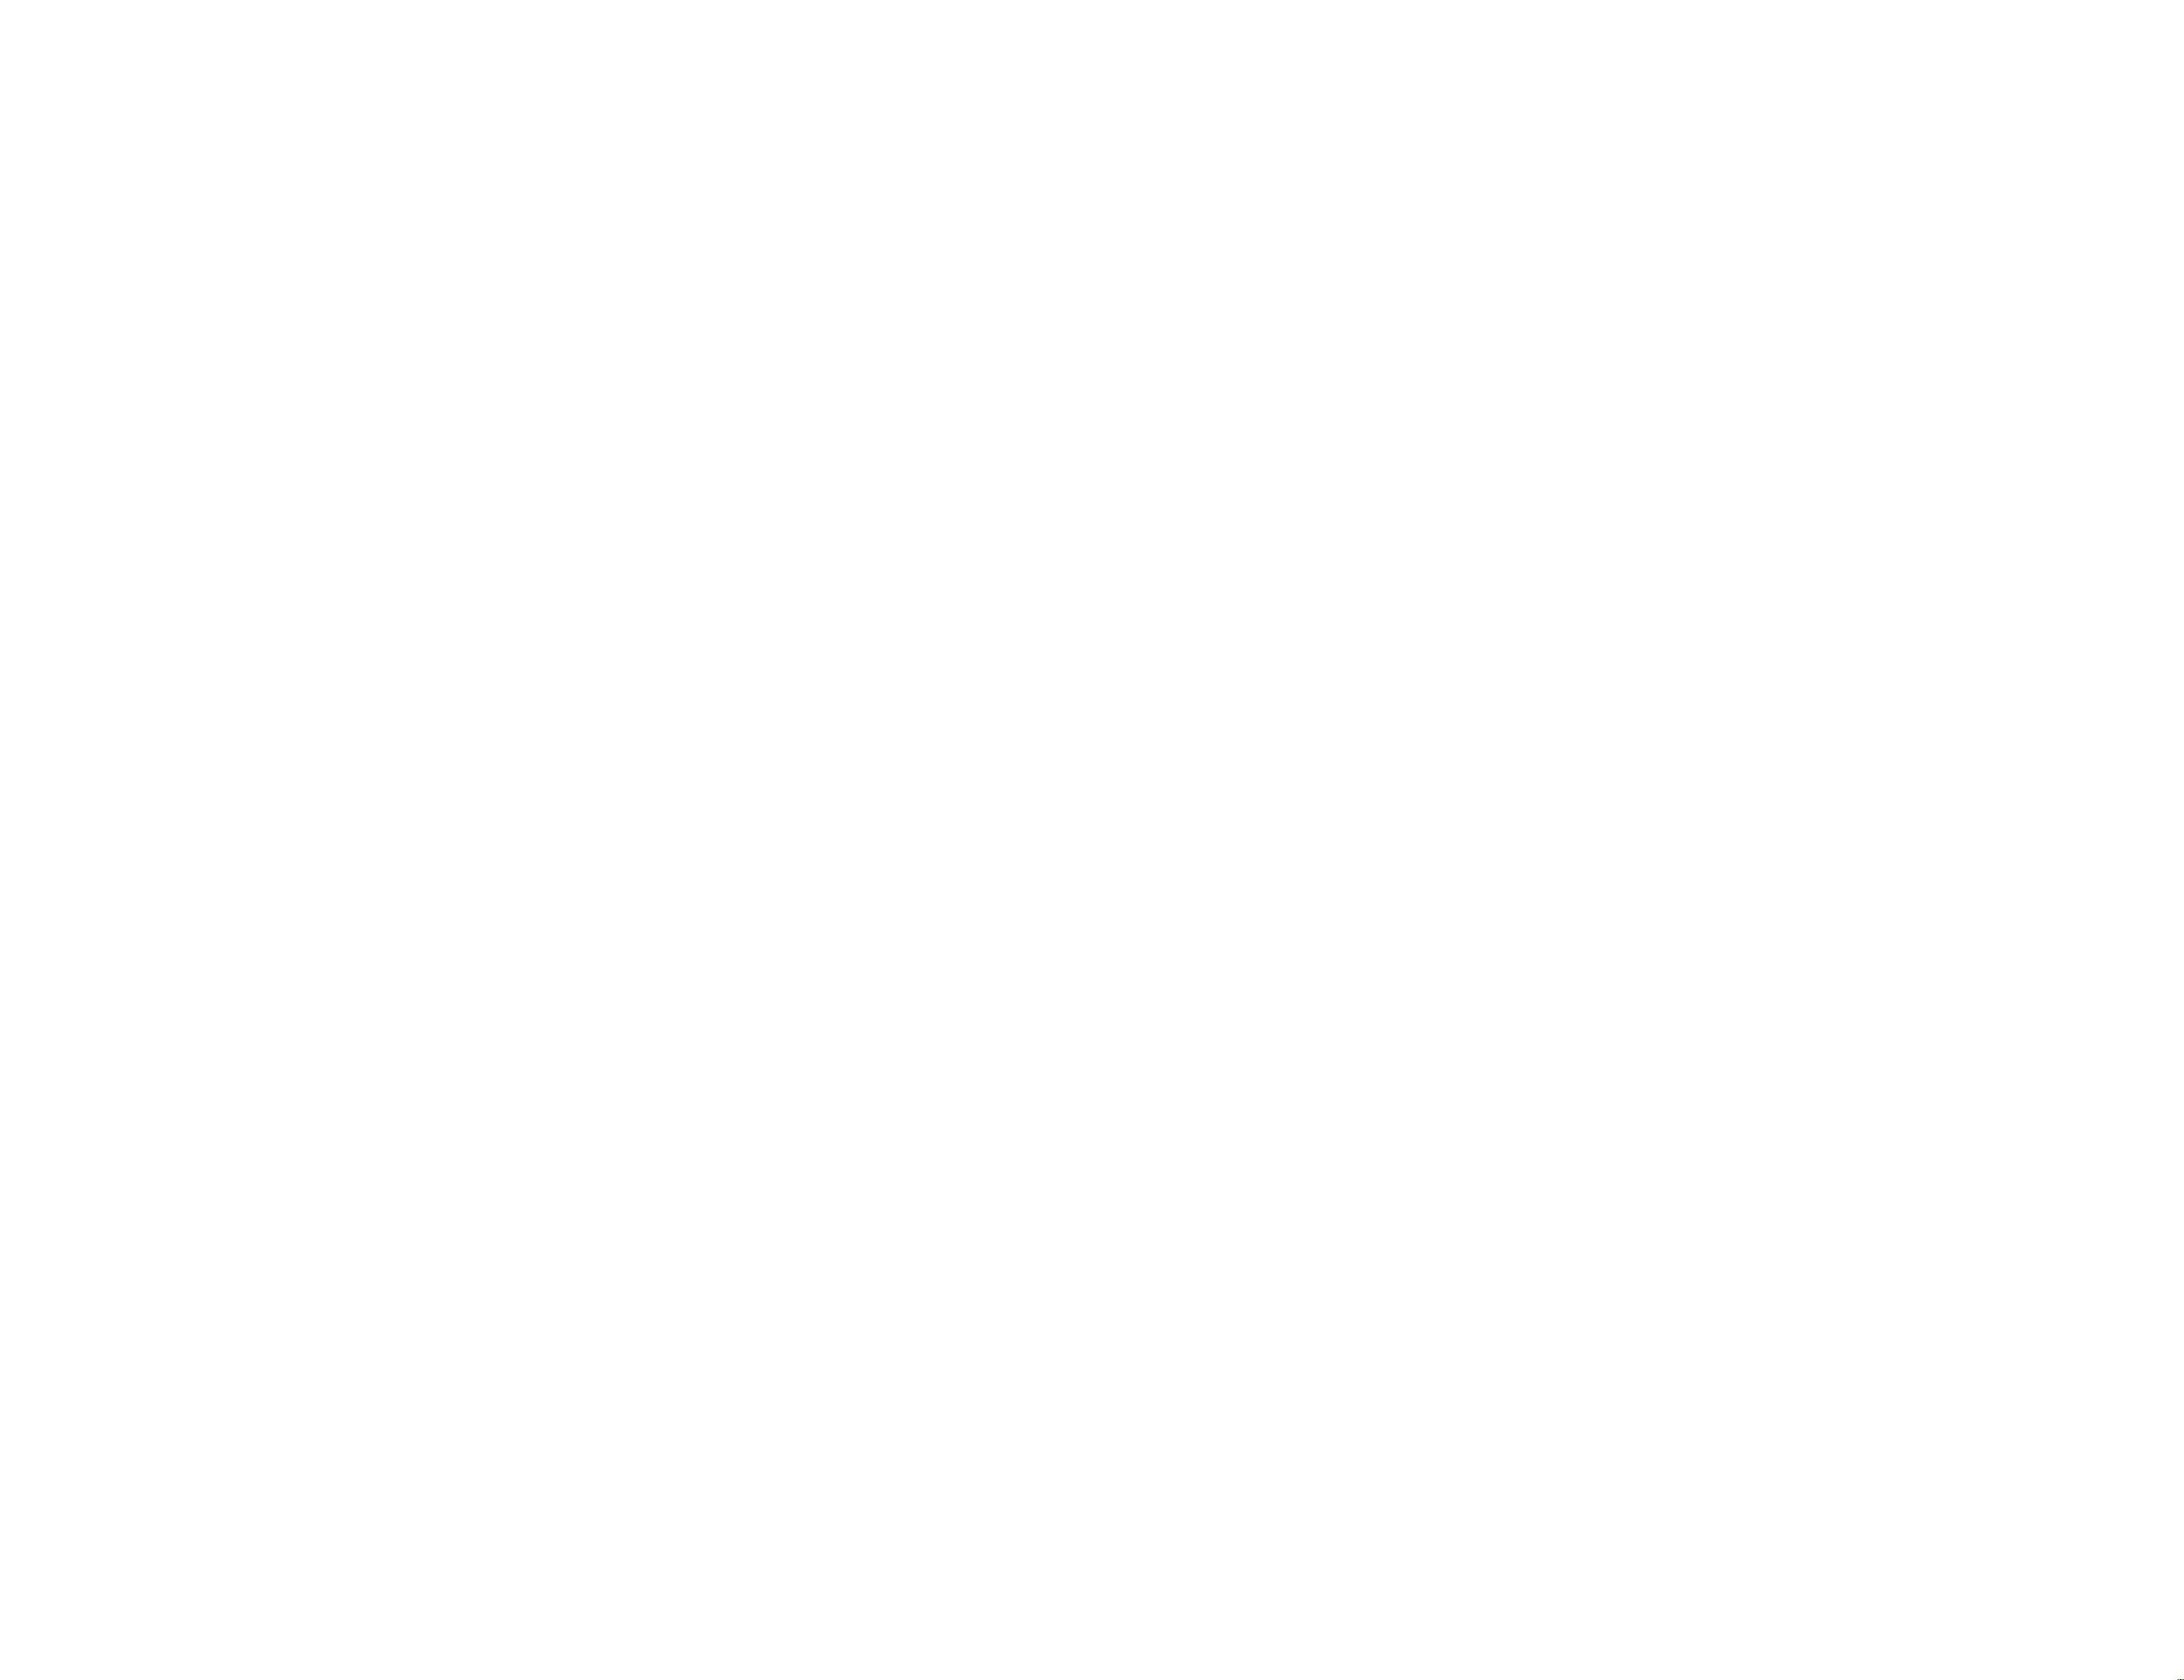 Team Voracity